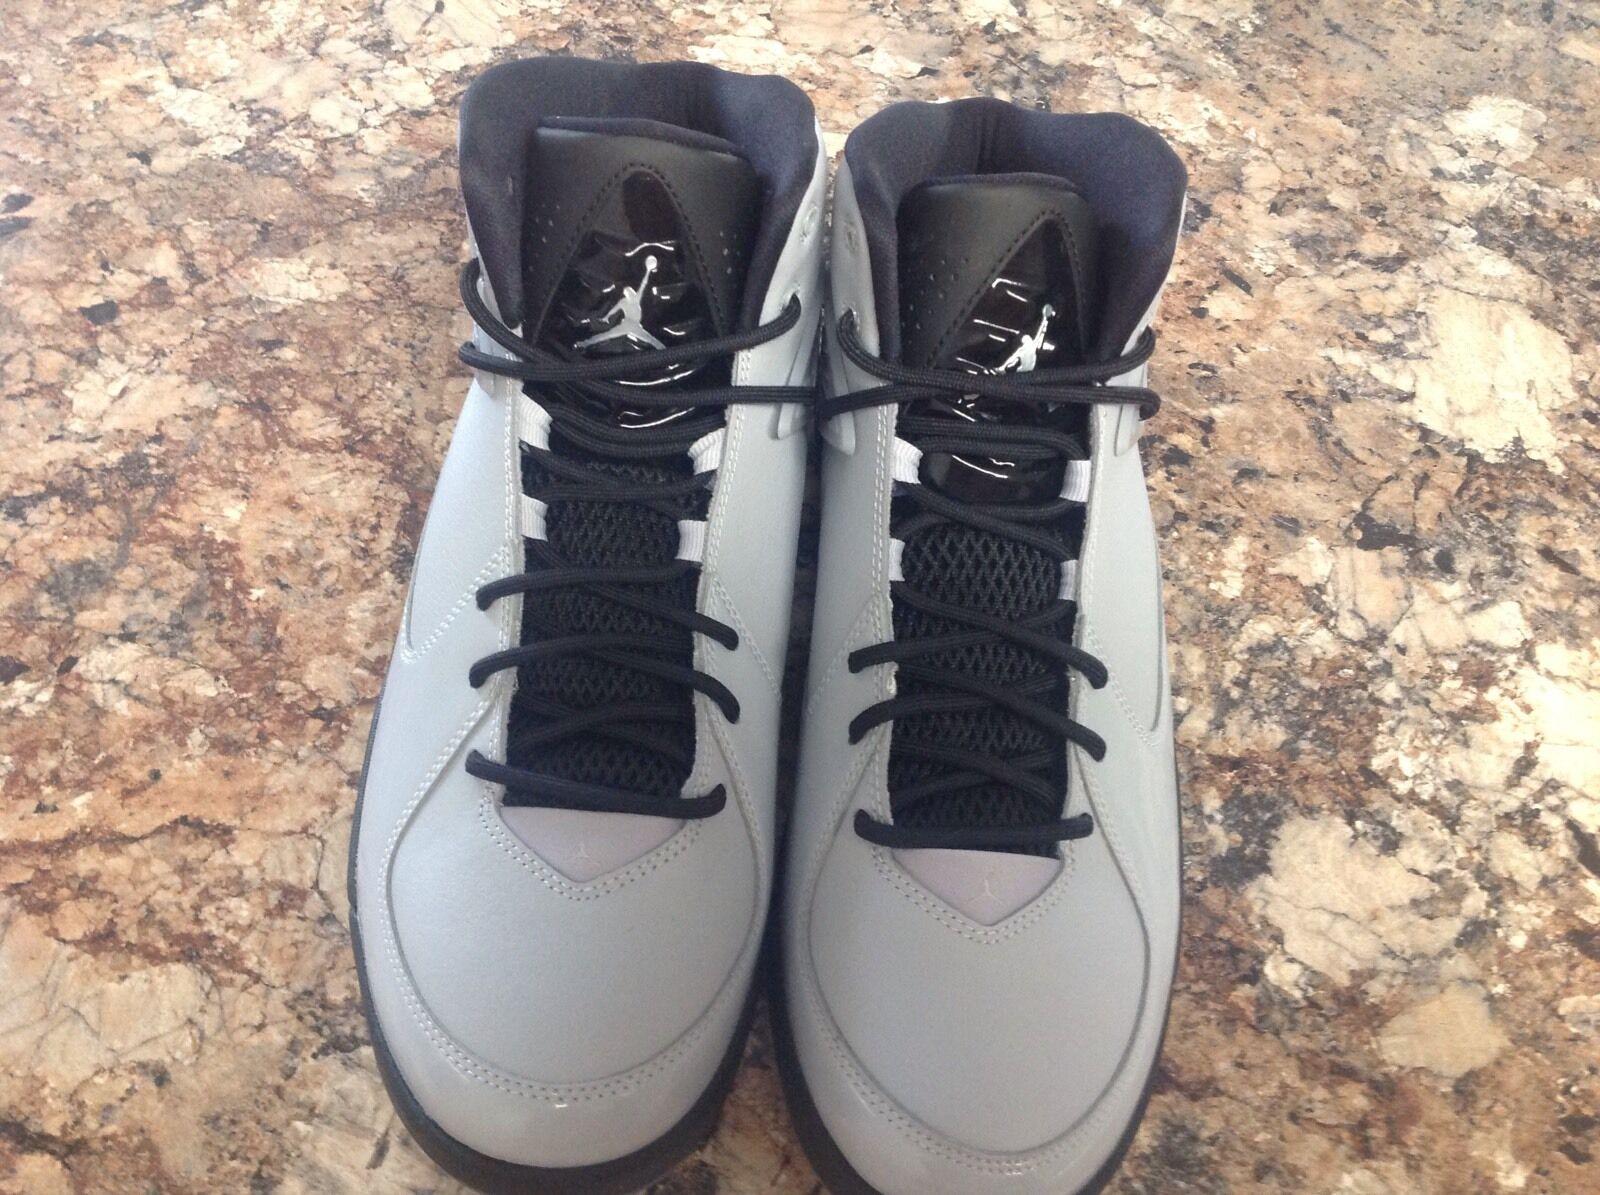 Nike Air Jordan Incline Black Blue White 705796-002 Basketball Shoes Men's 10